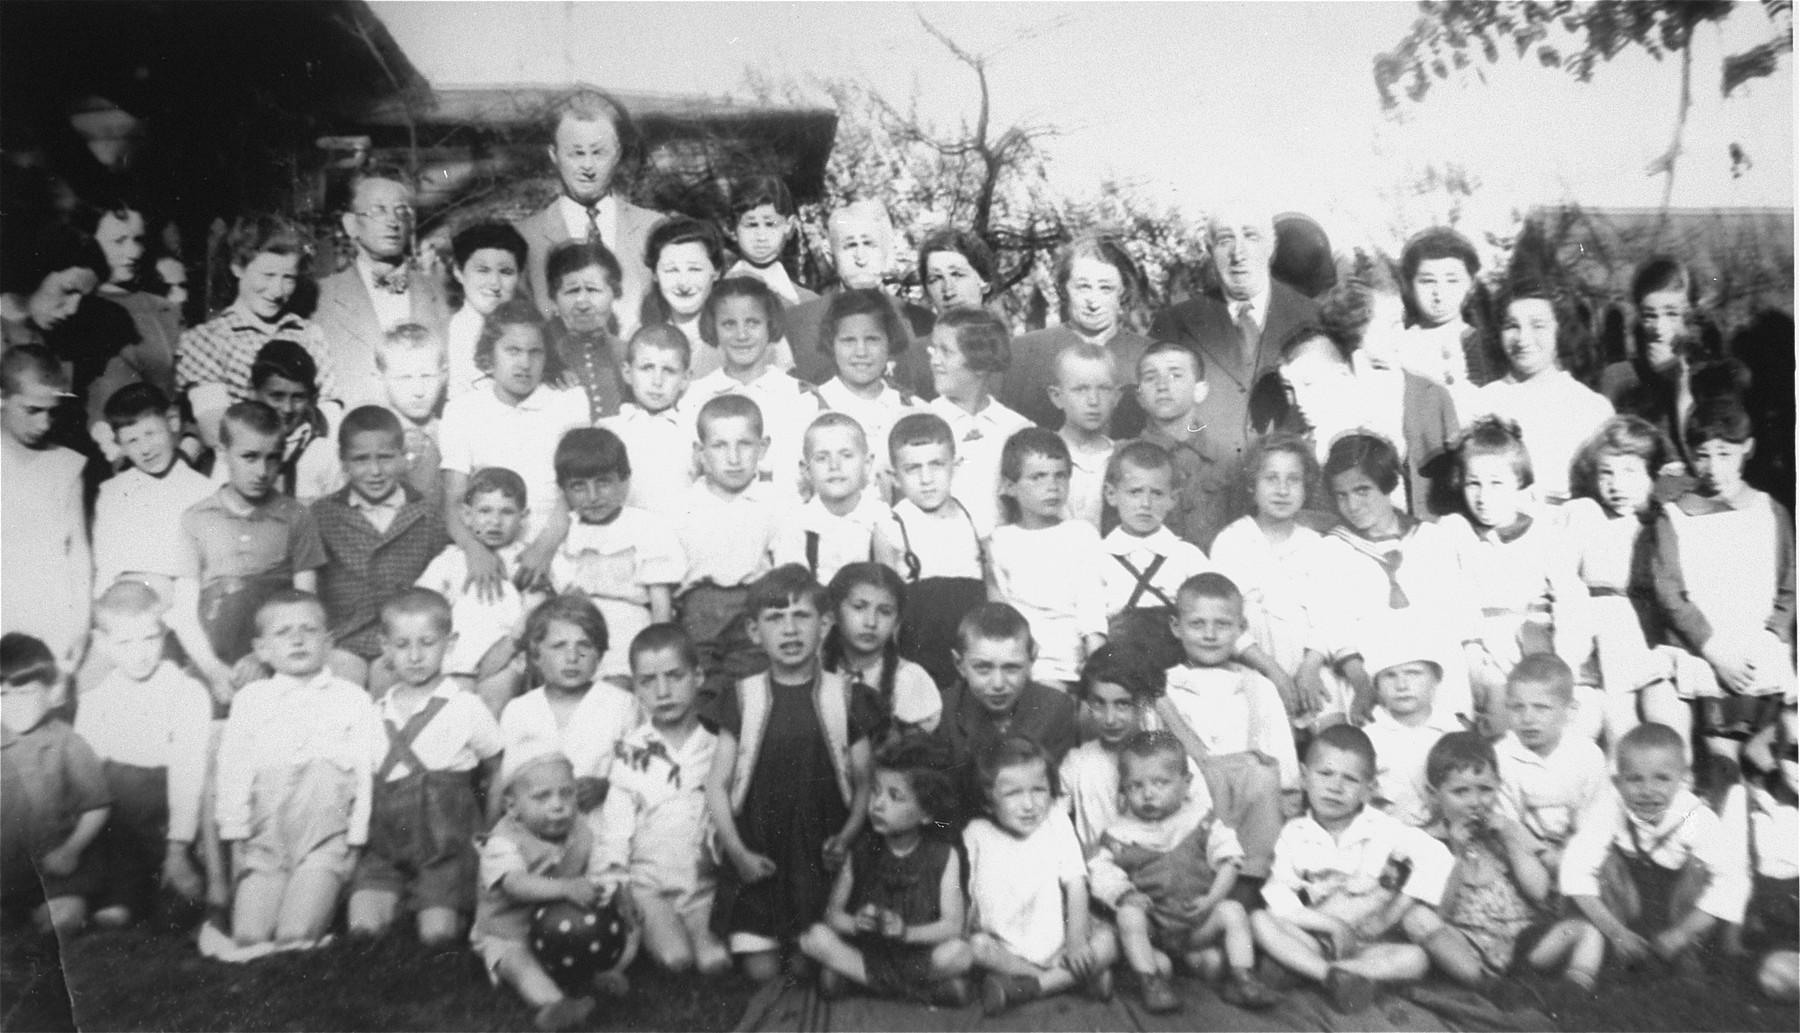 Group portrait of Jewish children in a day care program in the Kielce ghetto.